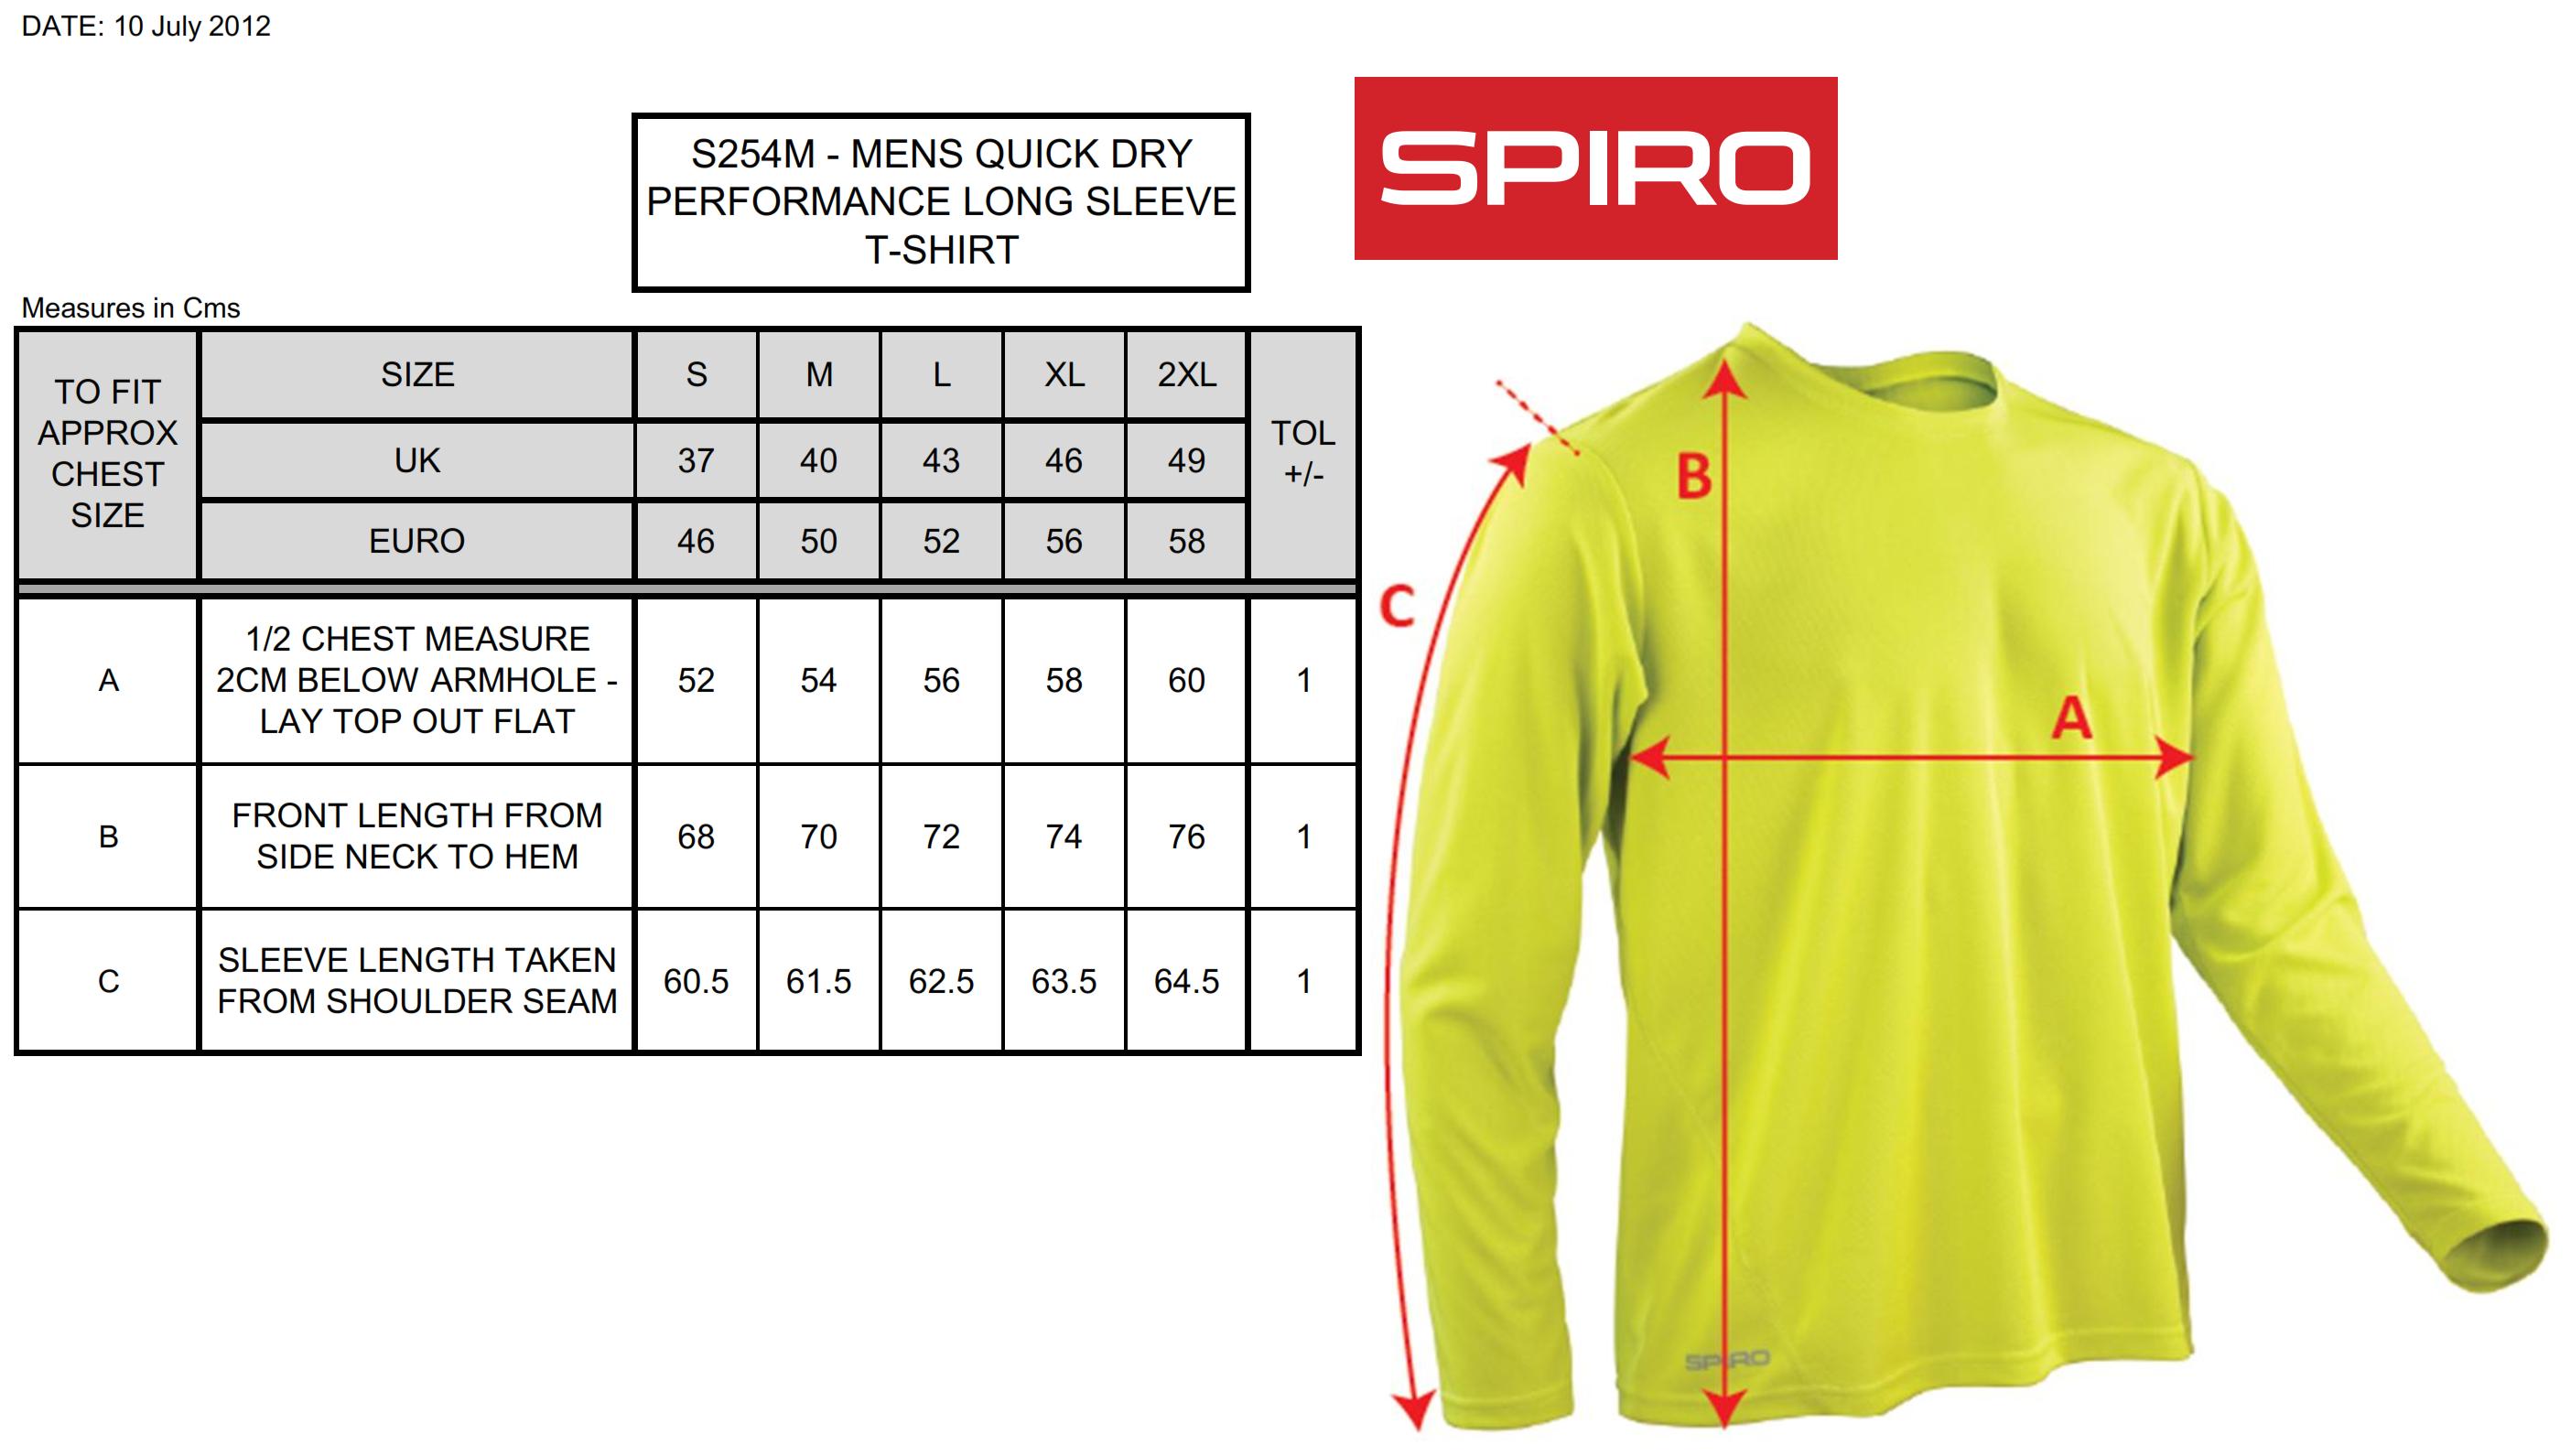 Result: Performance T-Shirt LS S254M